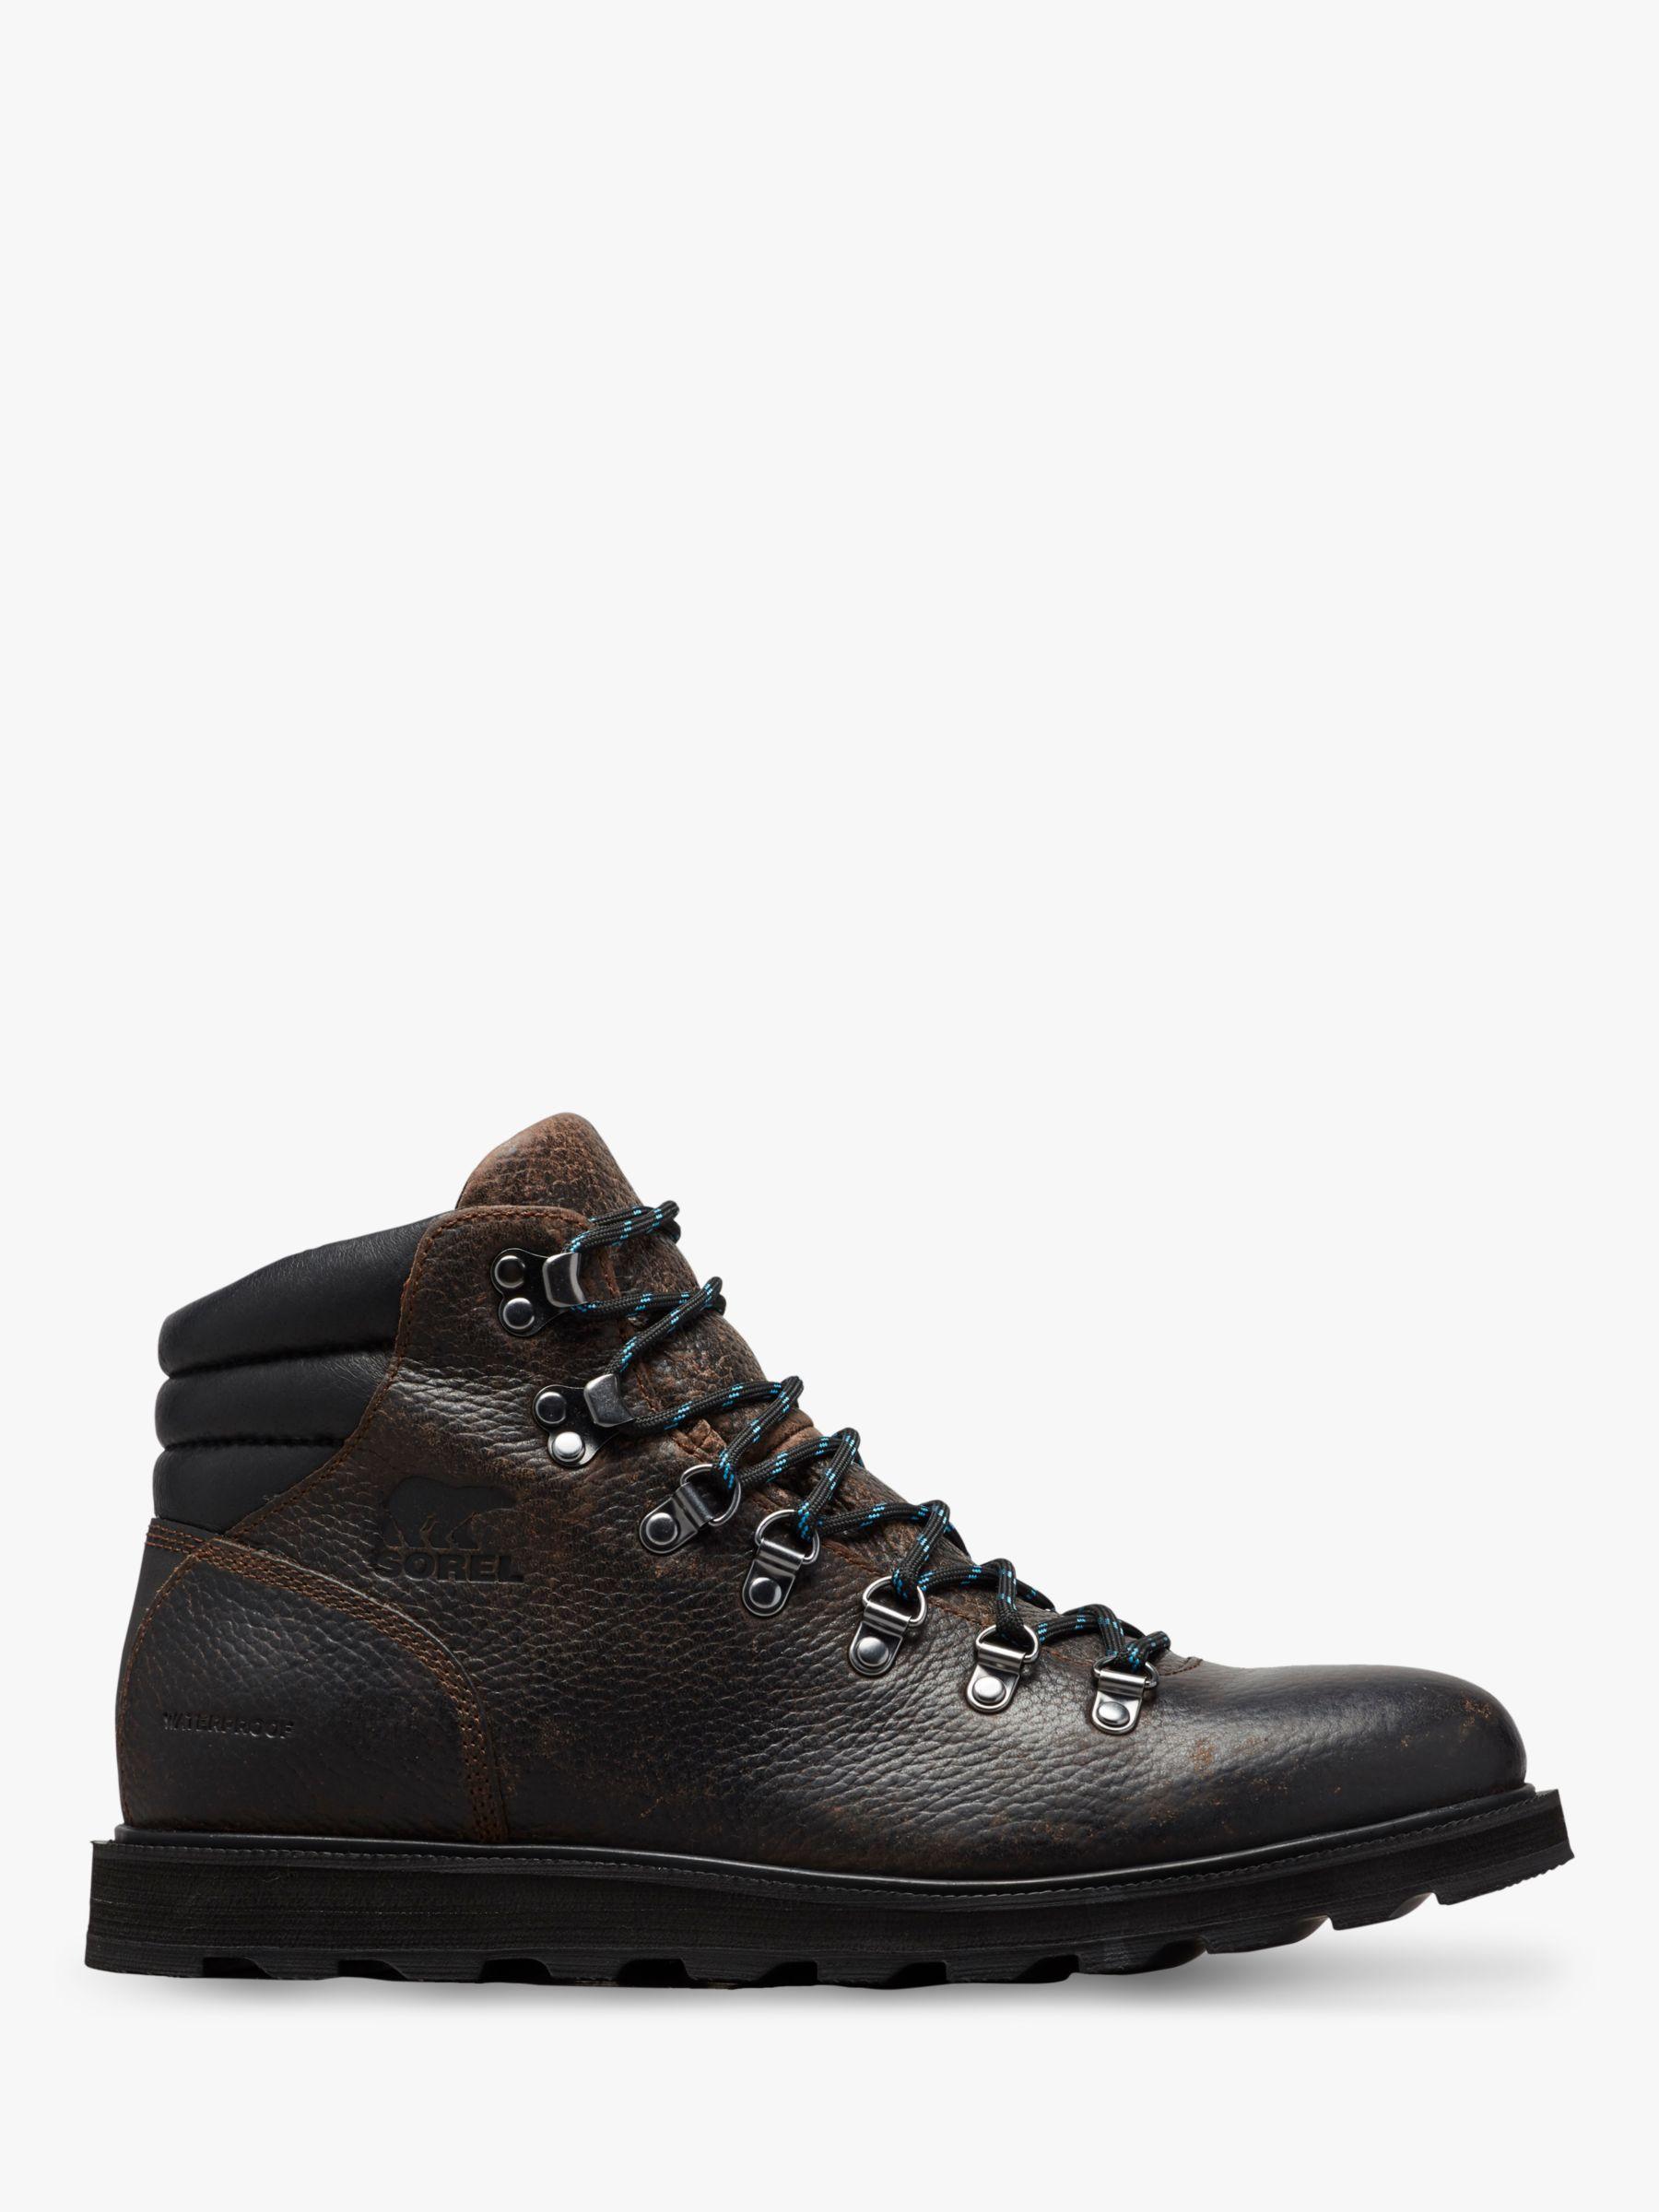 Sorel SOREL Madson Waterproof Hiker Boots, Tobacco